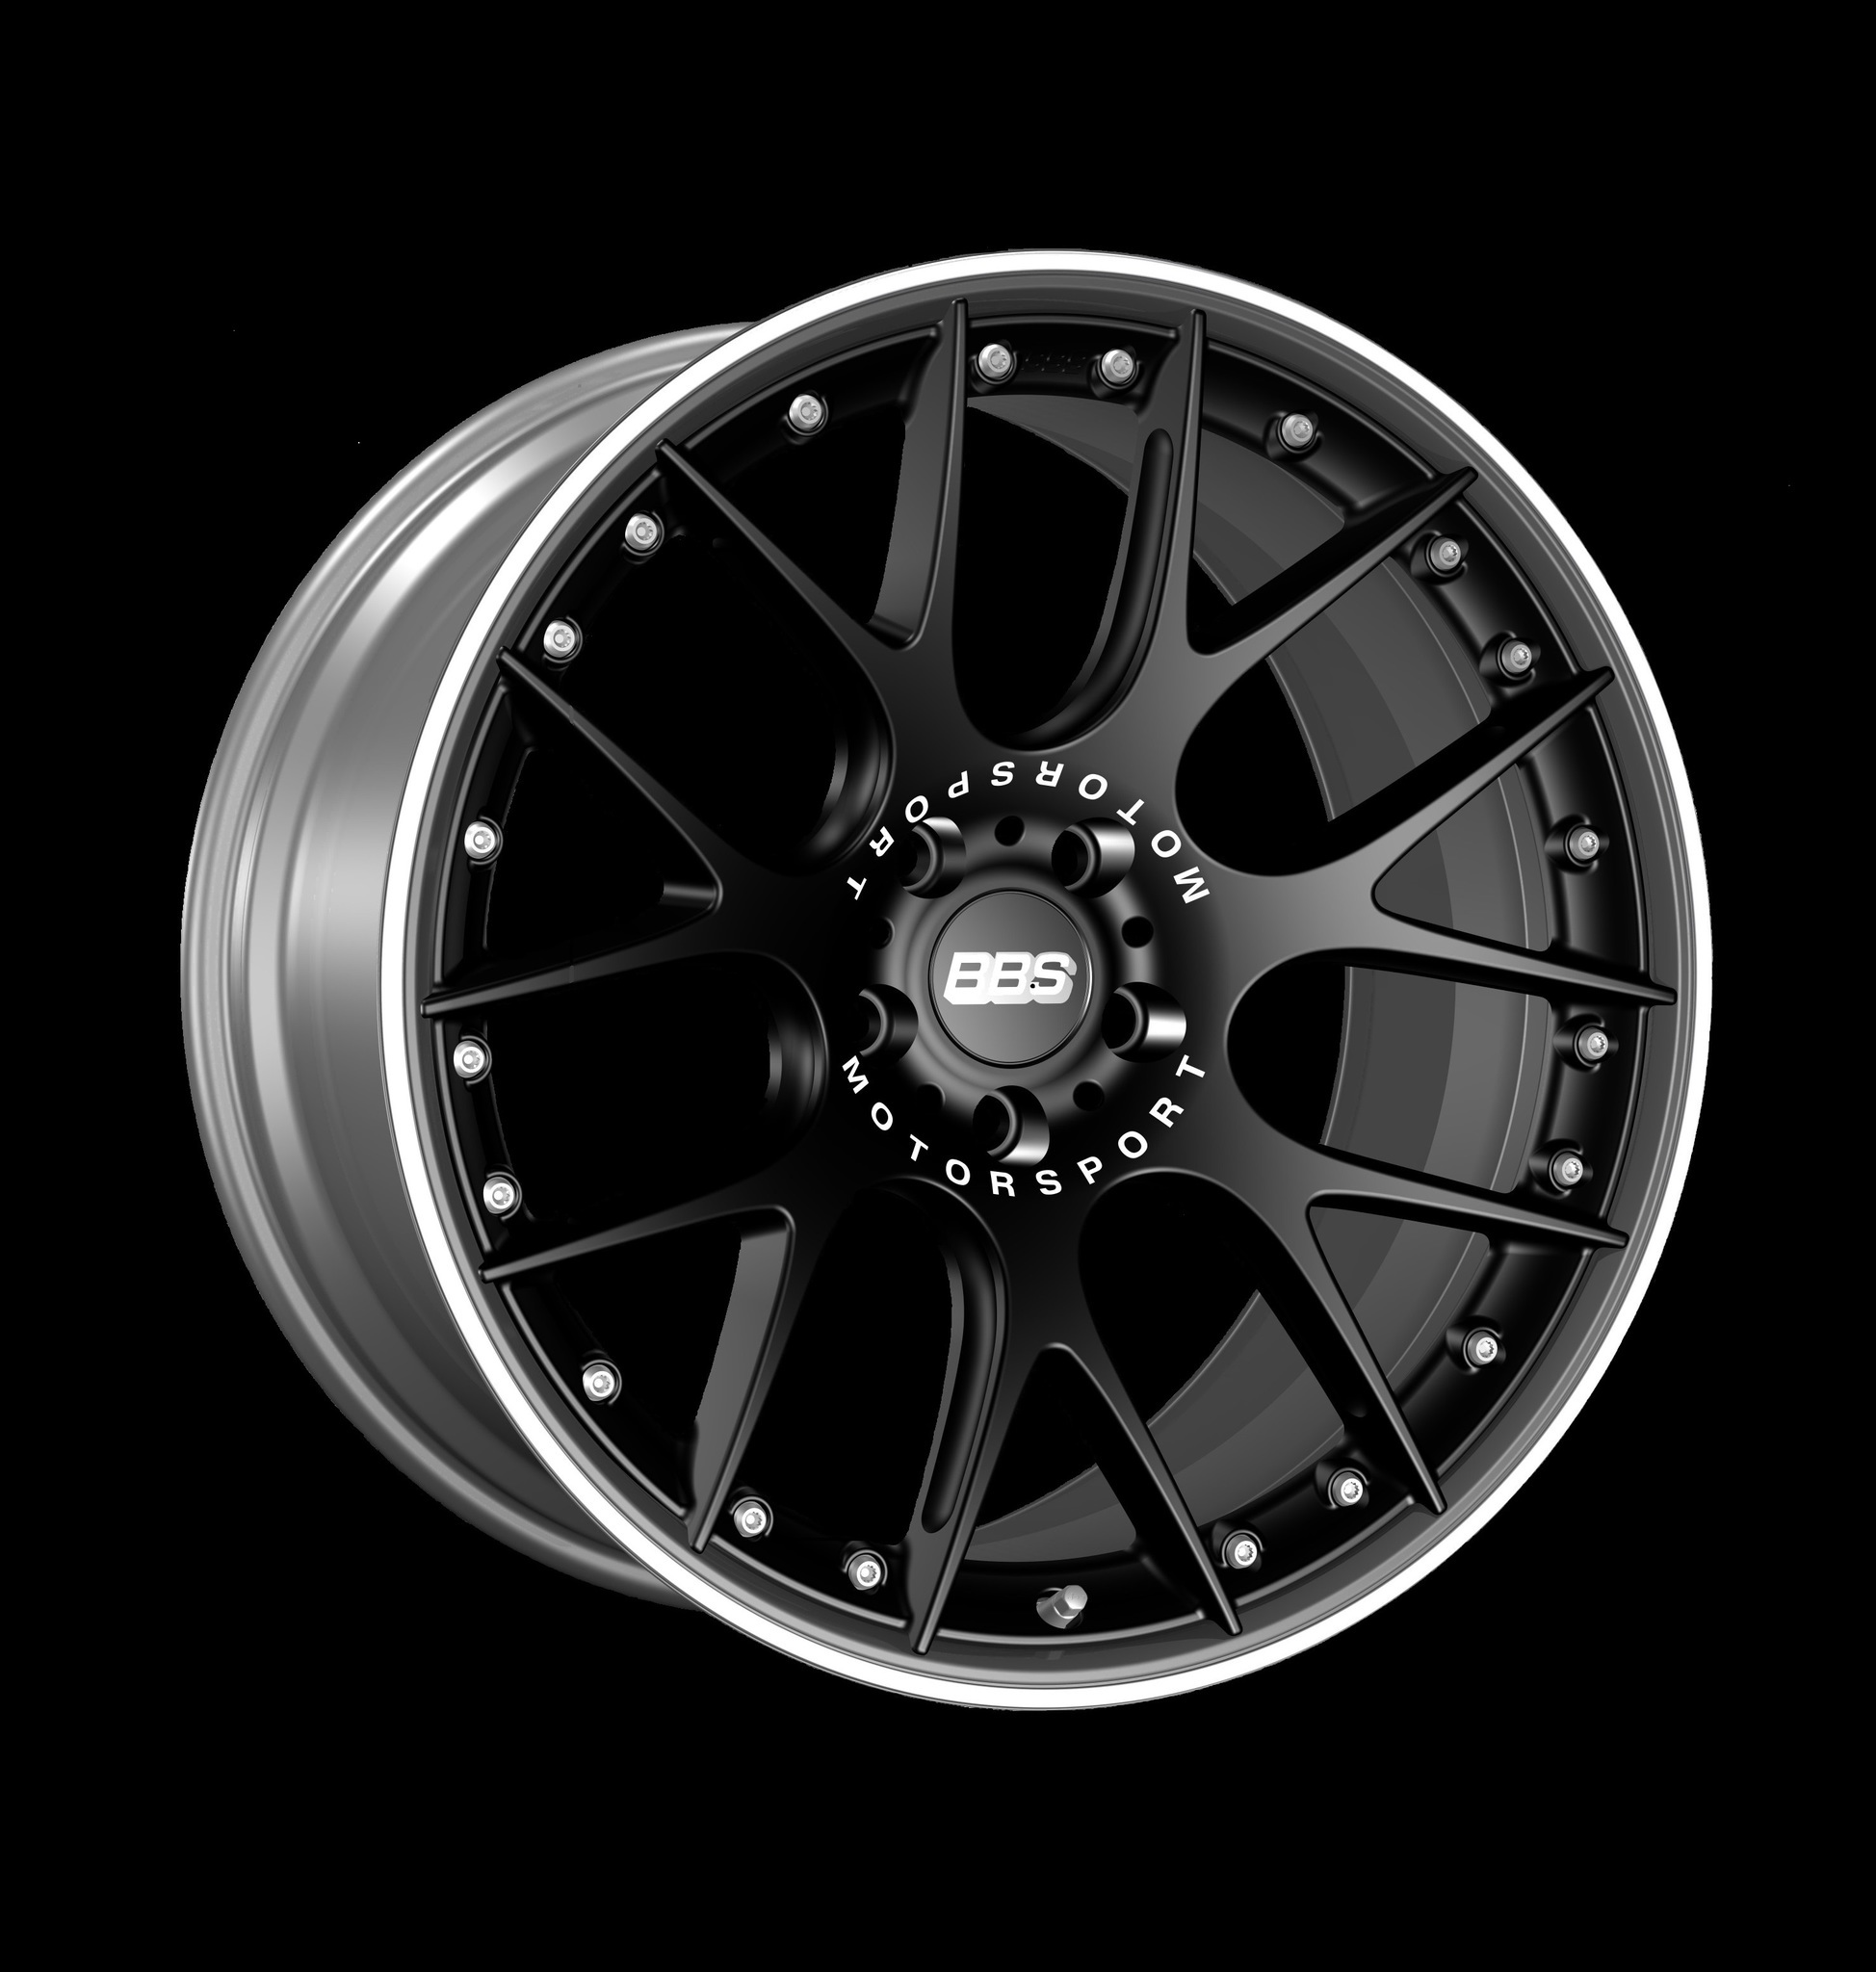 Диск колесный BBS CH-R II 10x22 5x120 ET38 CB72.5 satin black